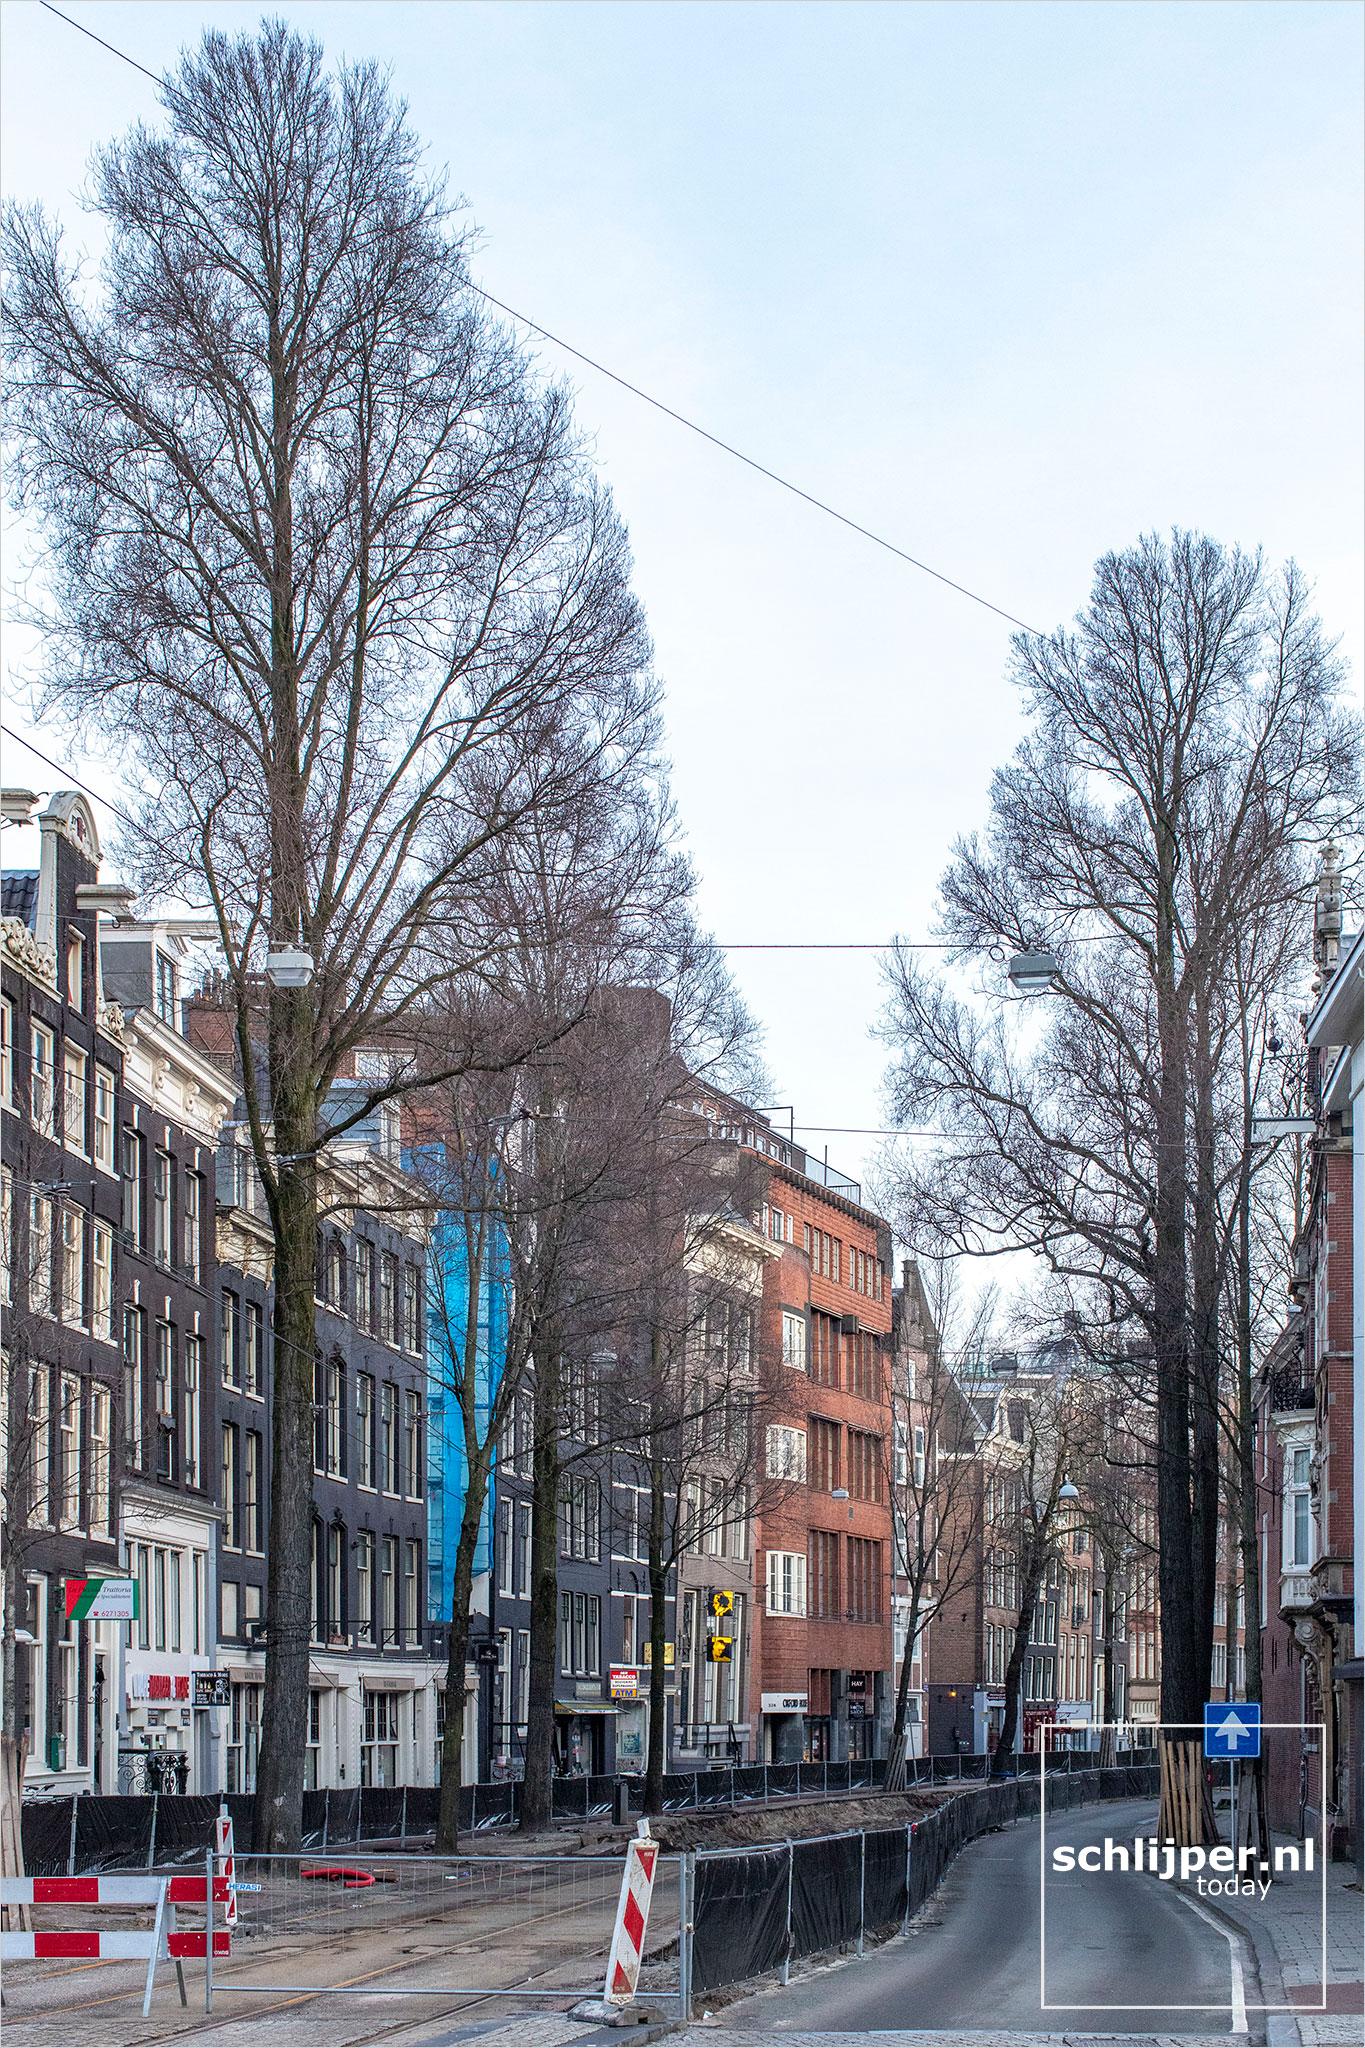 The Netherlands, Amsterdam, 20 februari 2021